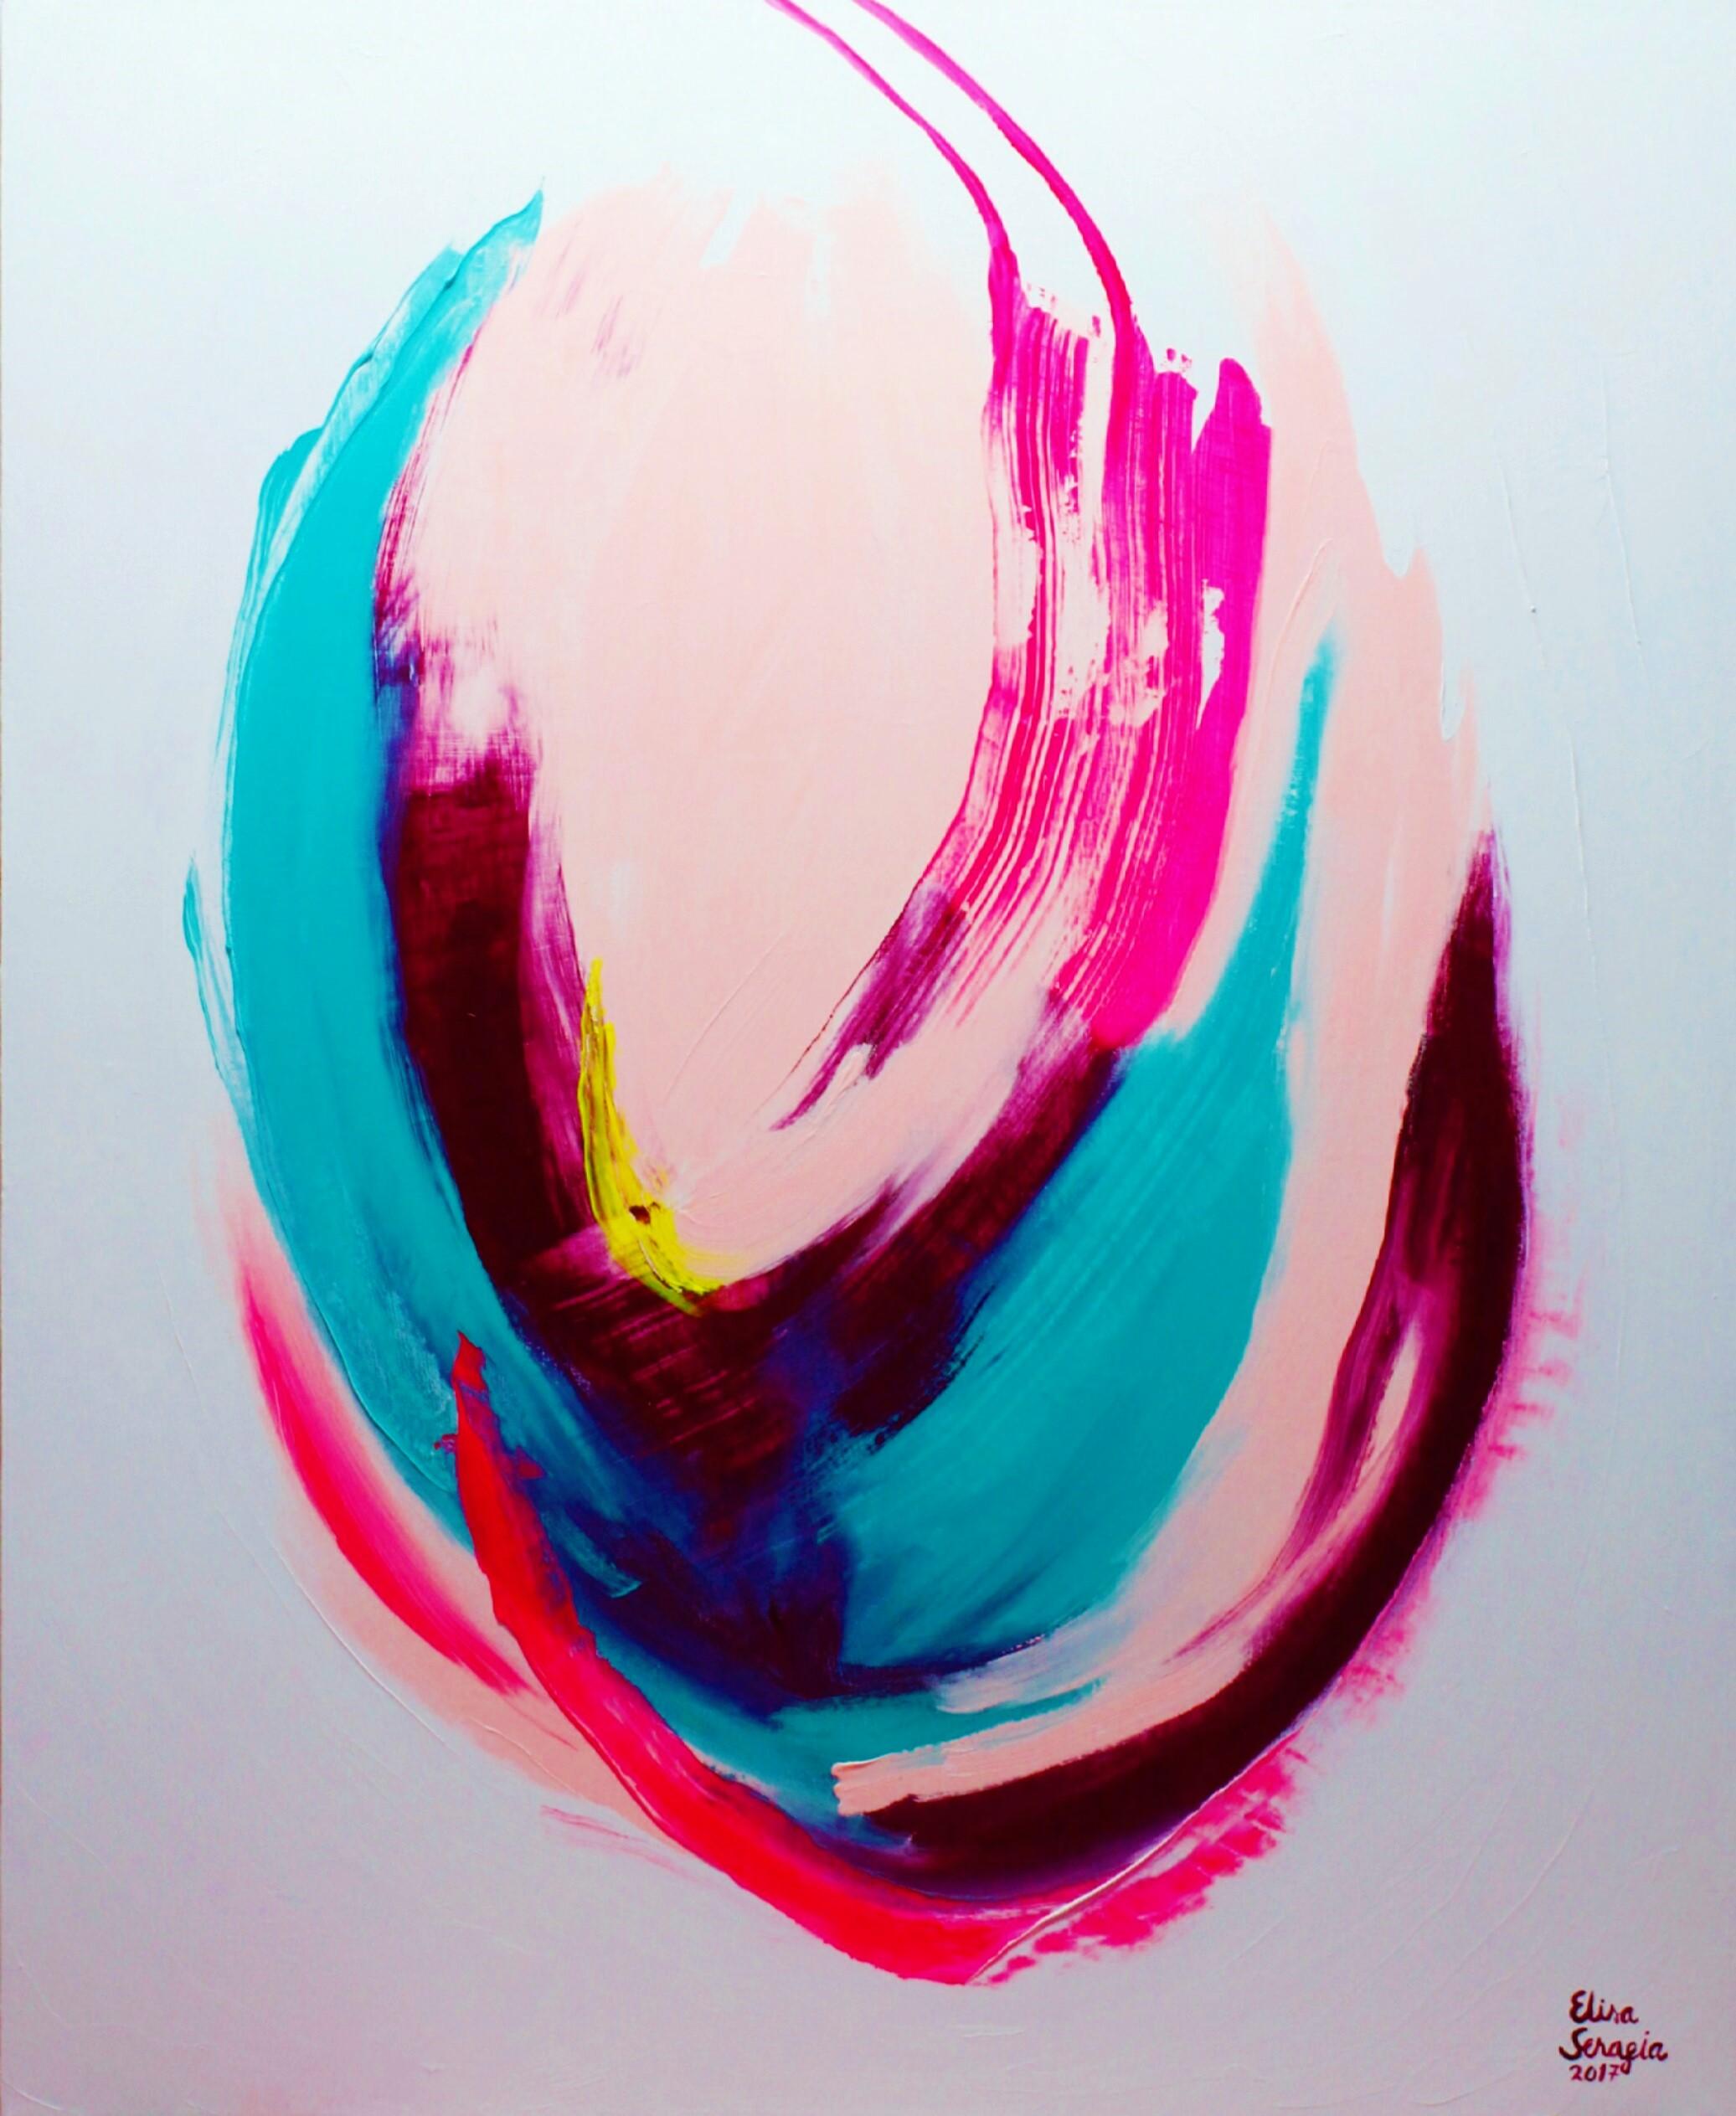 Alku, Akryyli kankaalle, 160 cm x 130 cm  Myyty / Sold